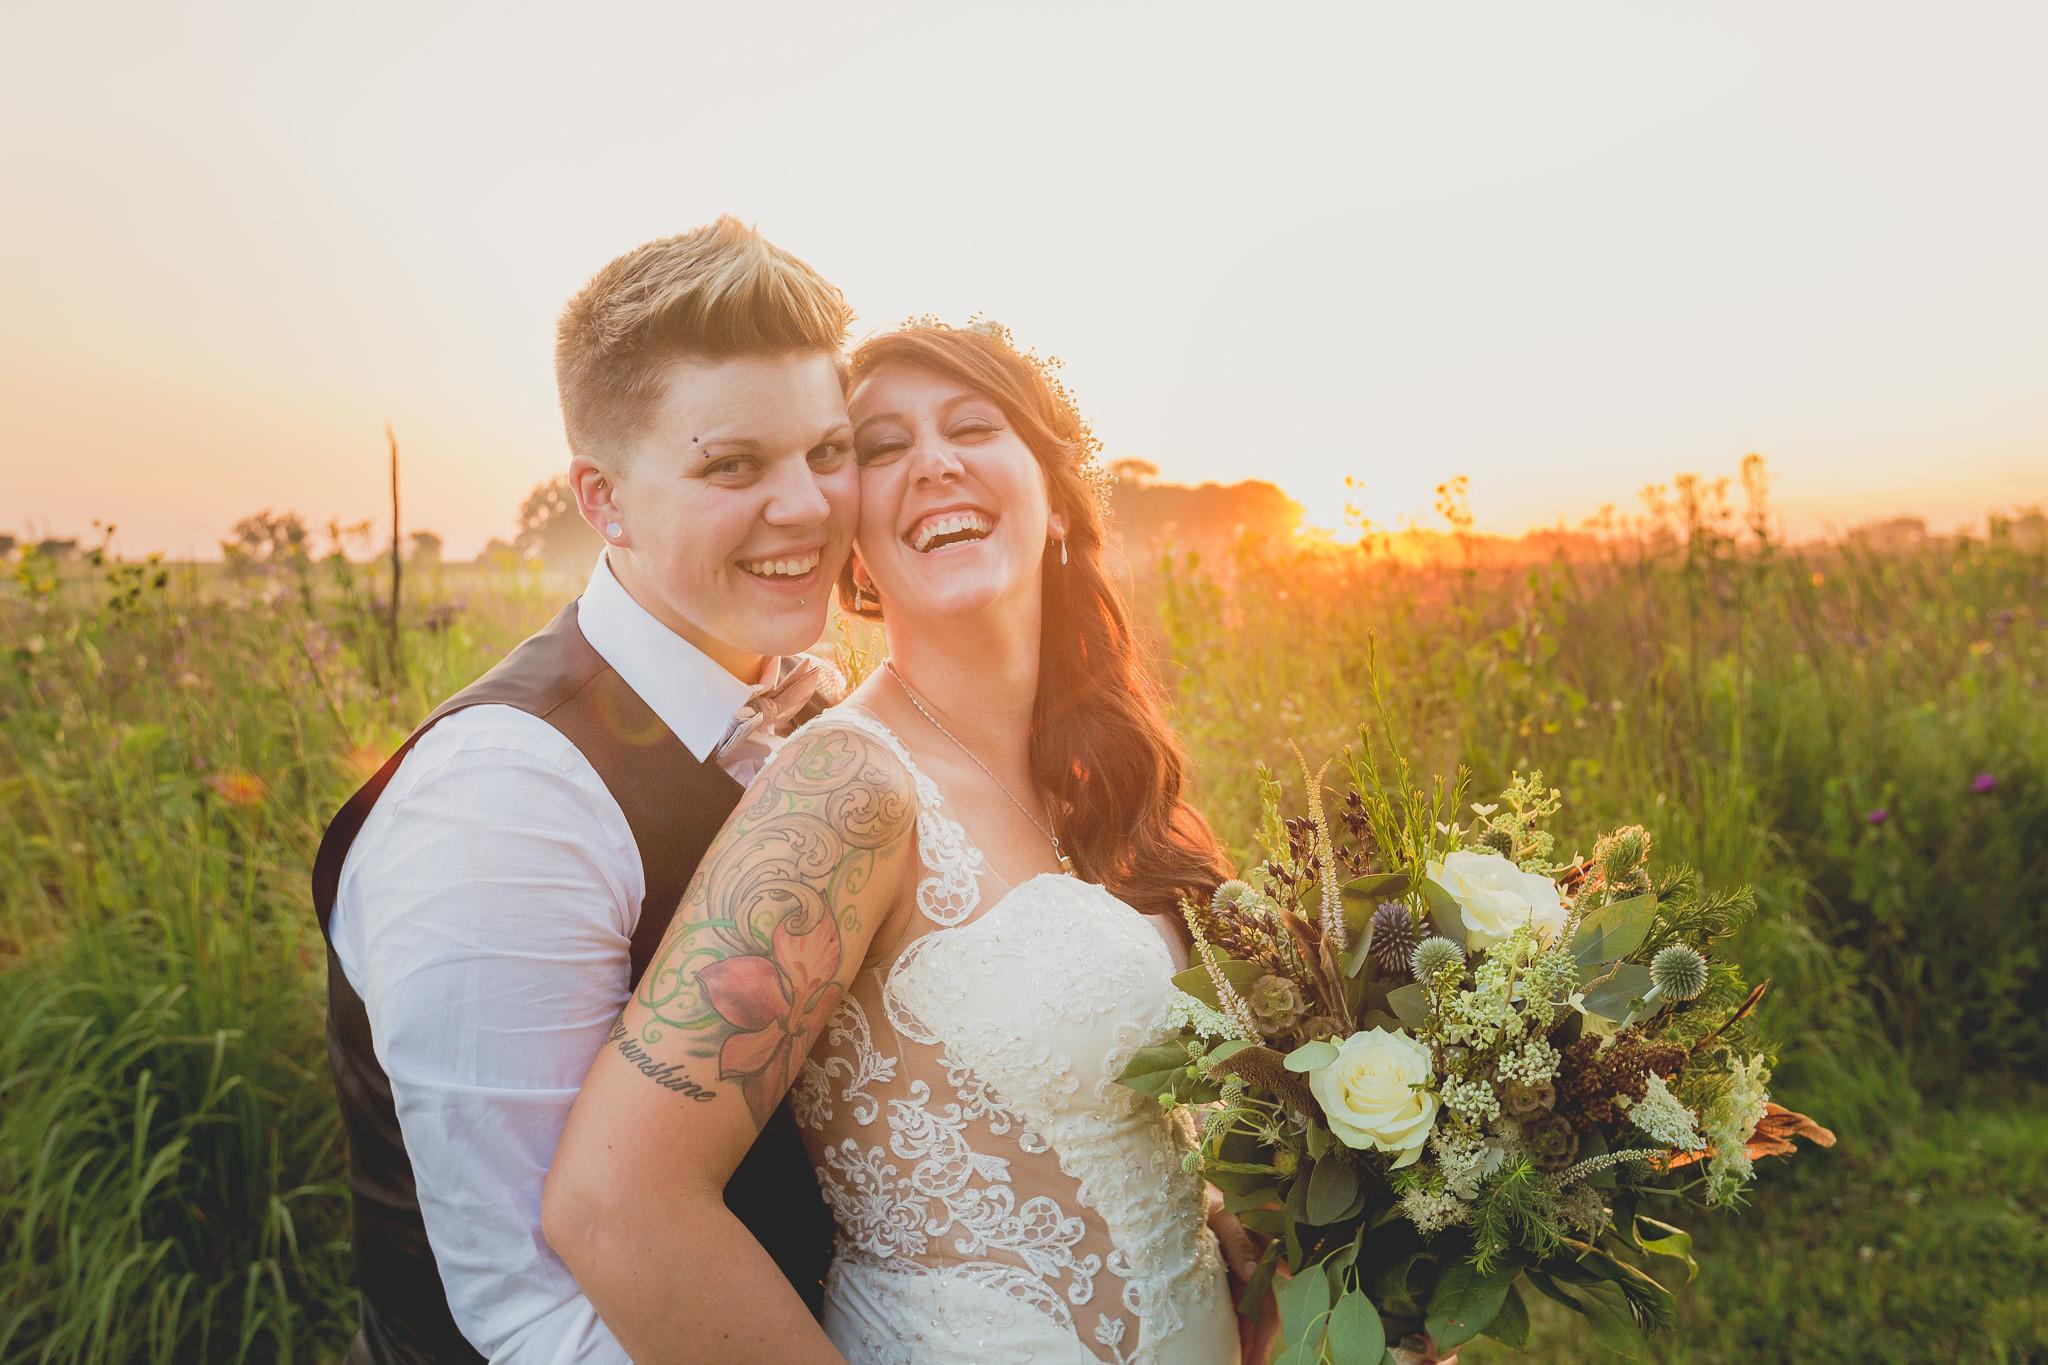 midwest same sex wedding photographer